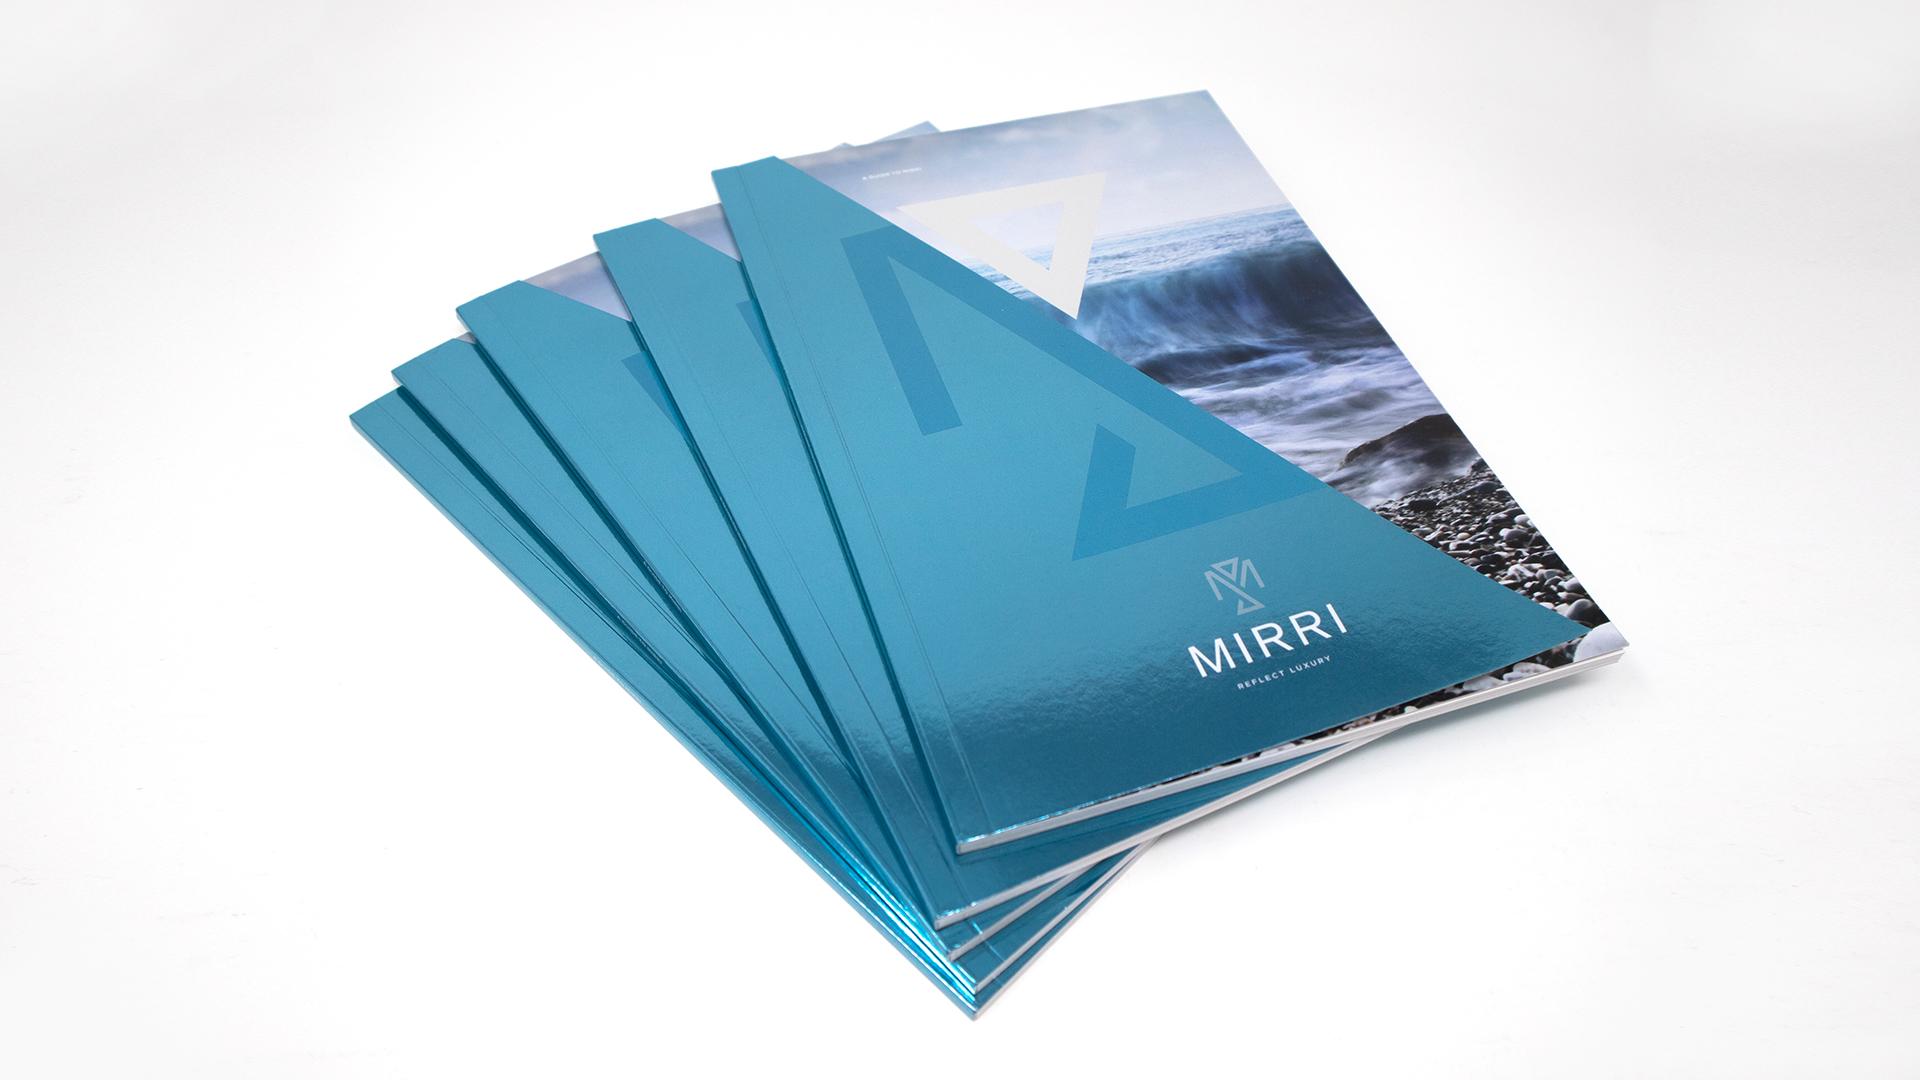 A-Guide-to-Mirri-8